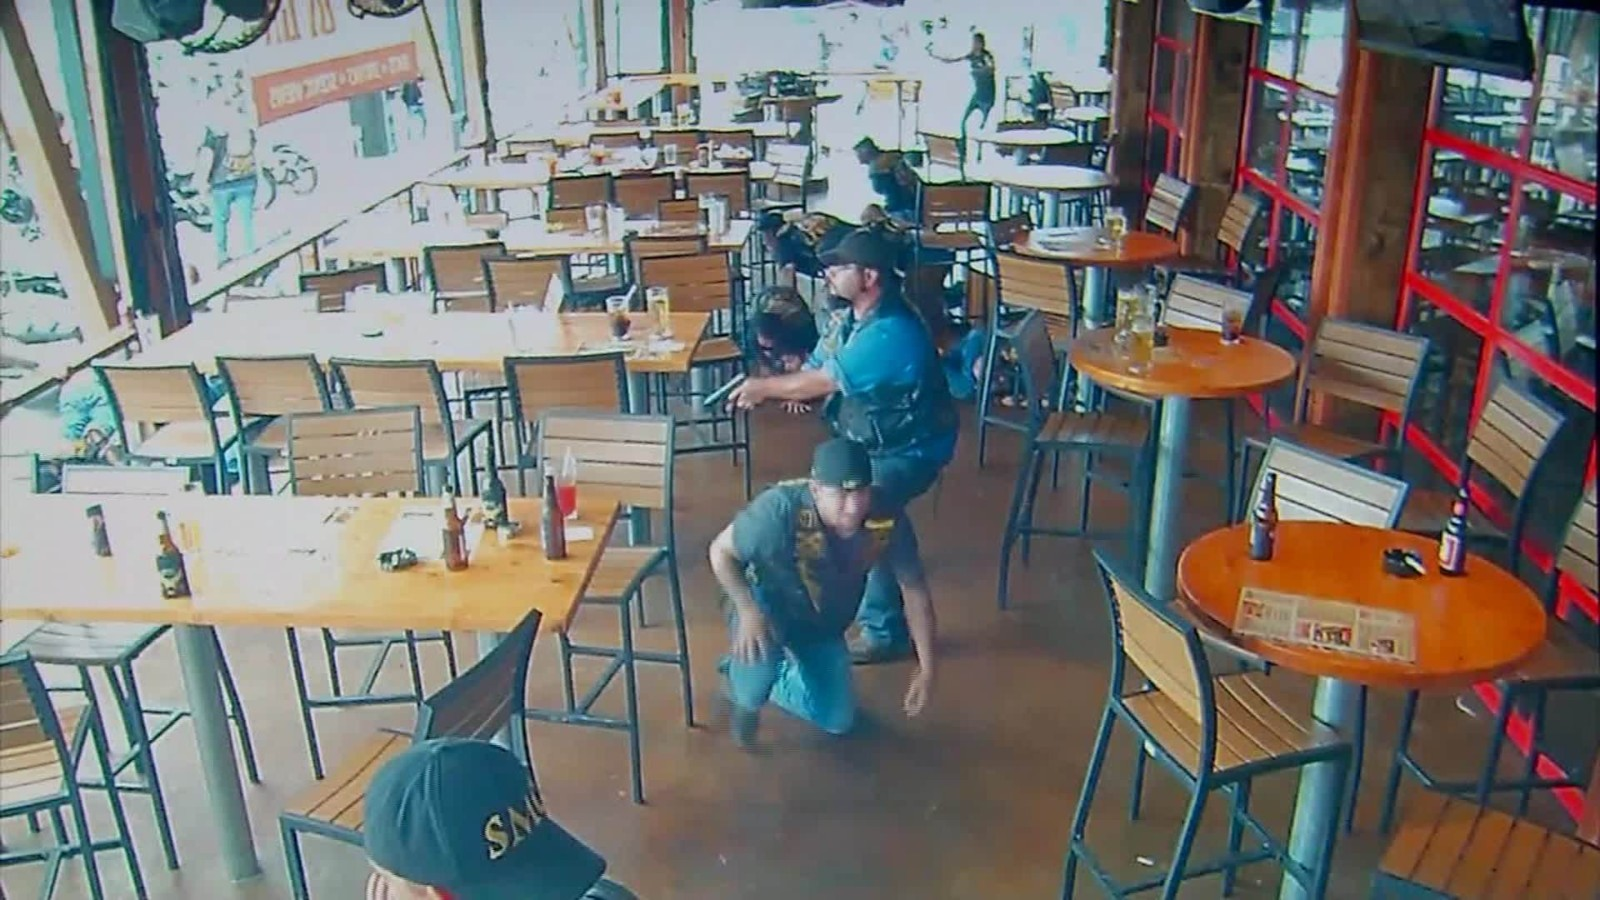 Waco biker shooting surveillance video released - CNN Video